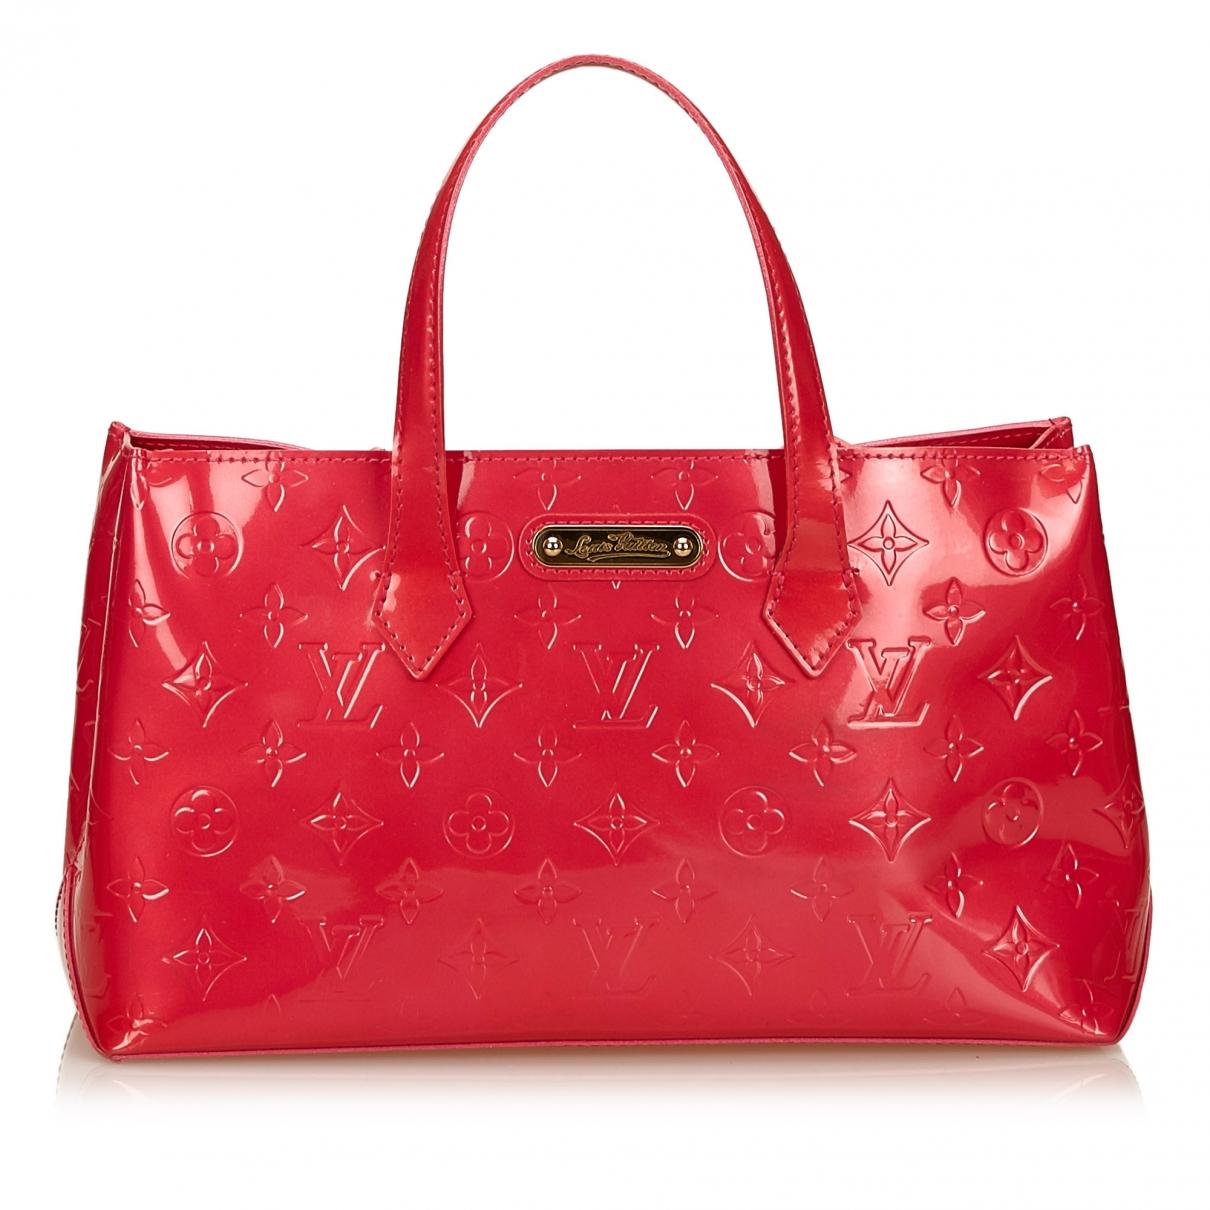 Louis Vuitton Wilshire Pink Leather handbag for Women \N